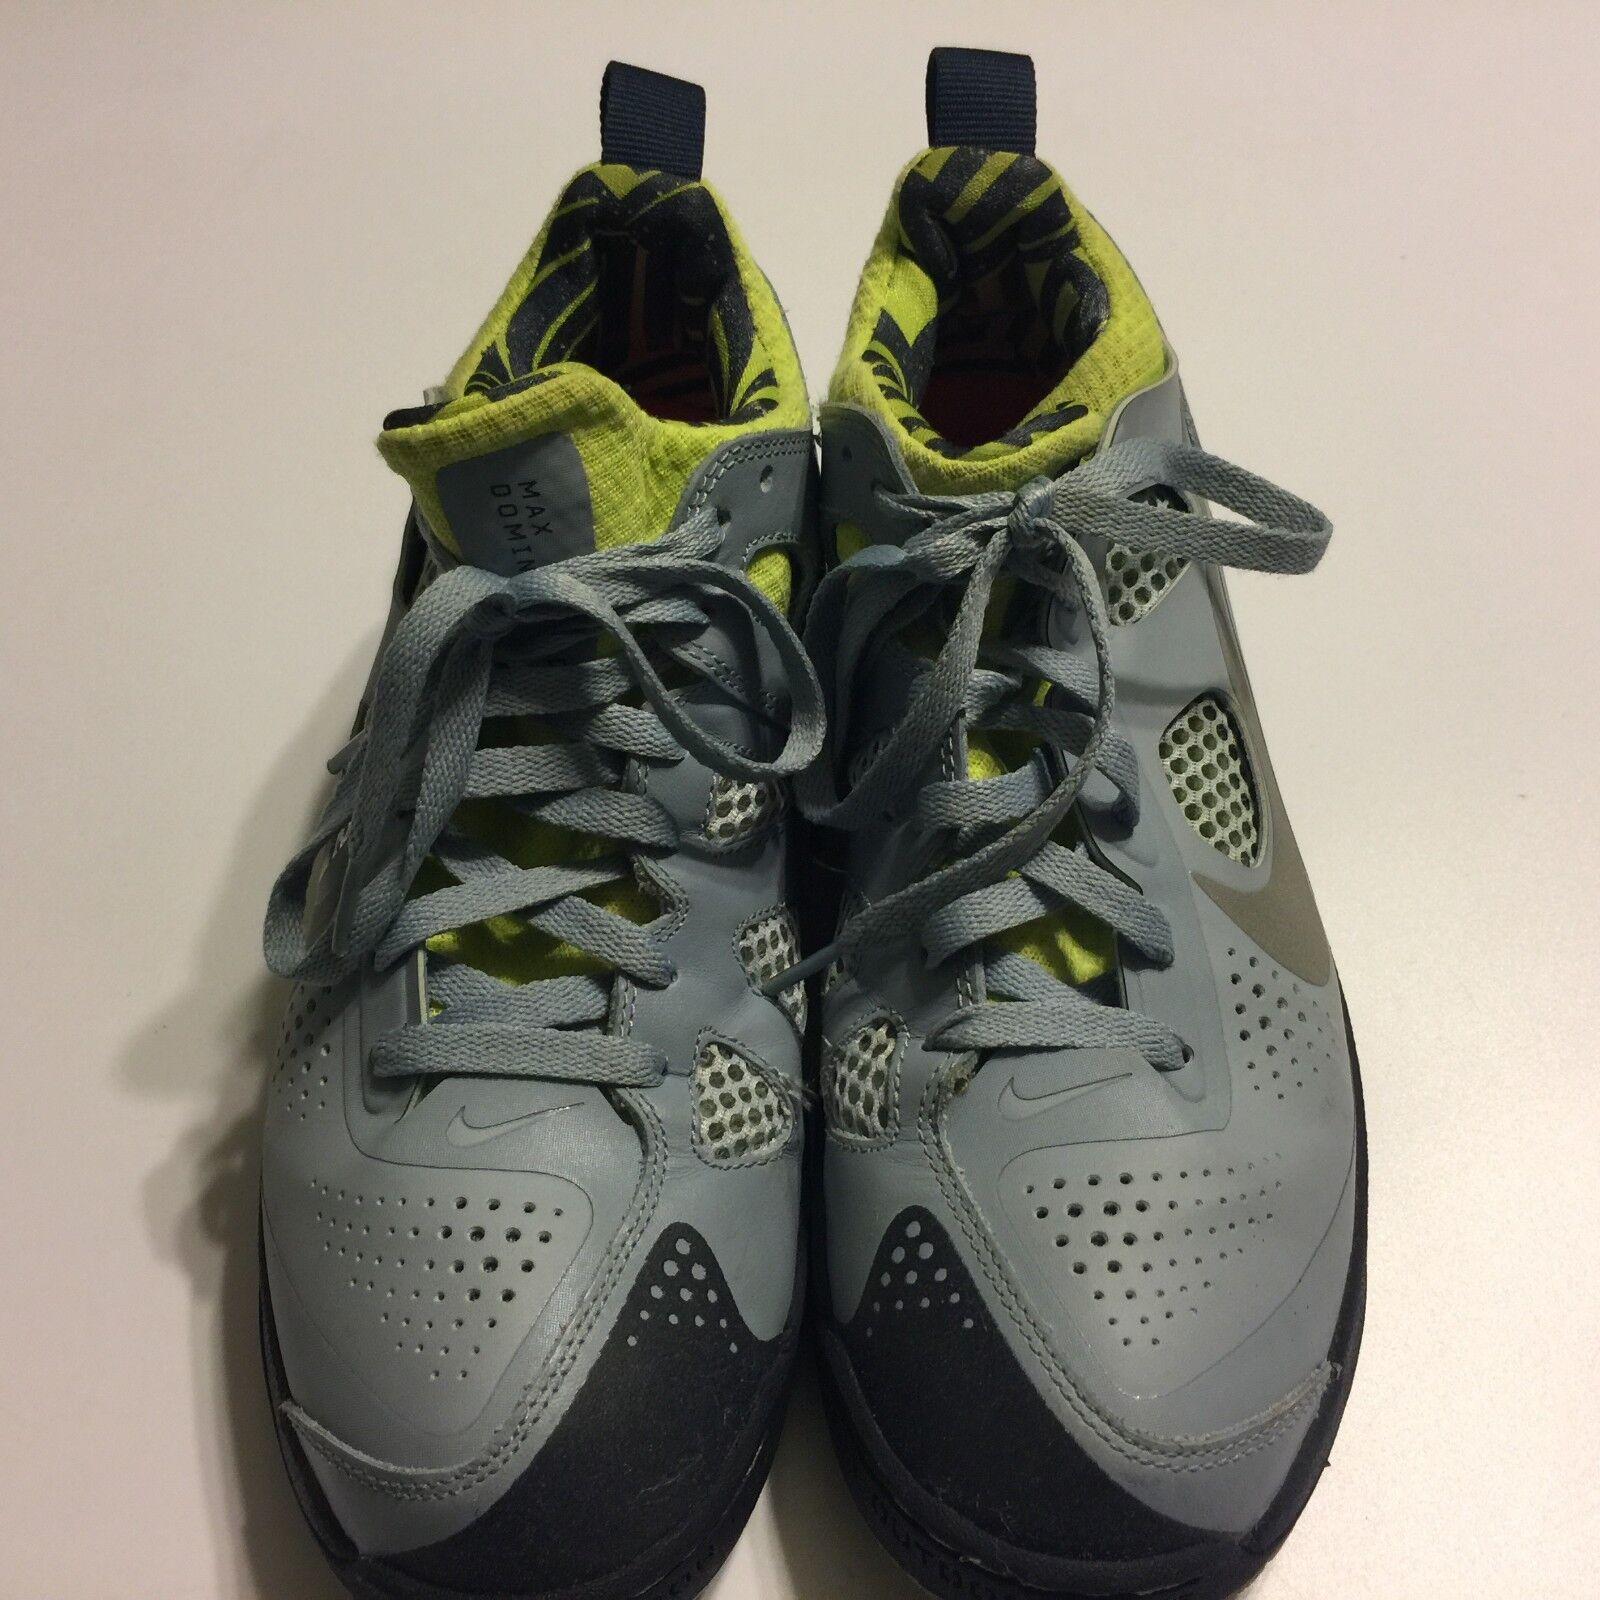 8034f383c59 ... Nike Max Dominante XD 511367-400 Men Gray Basketball Basketball  Basketball Sport Gym Shoes Size ...